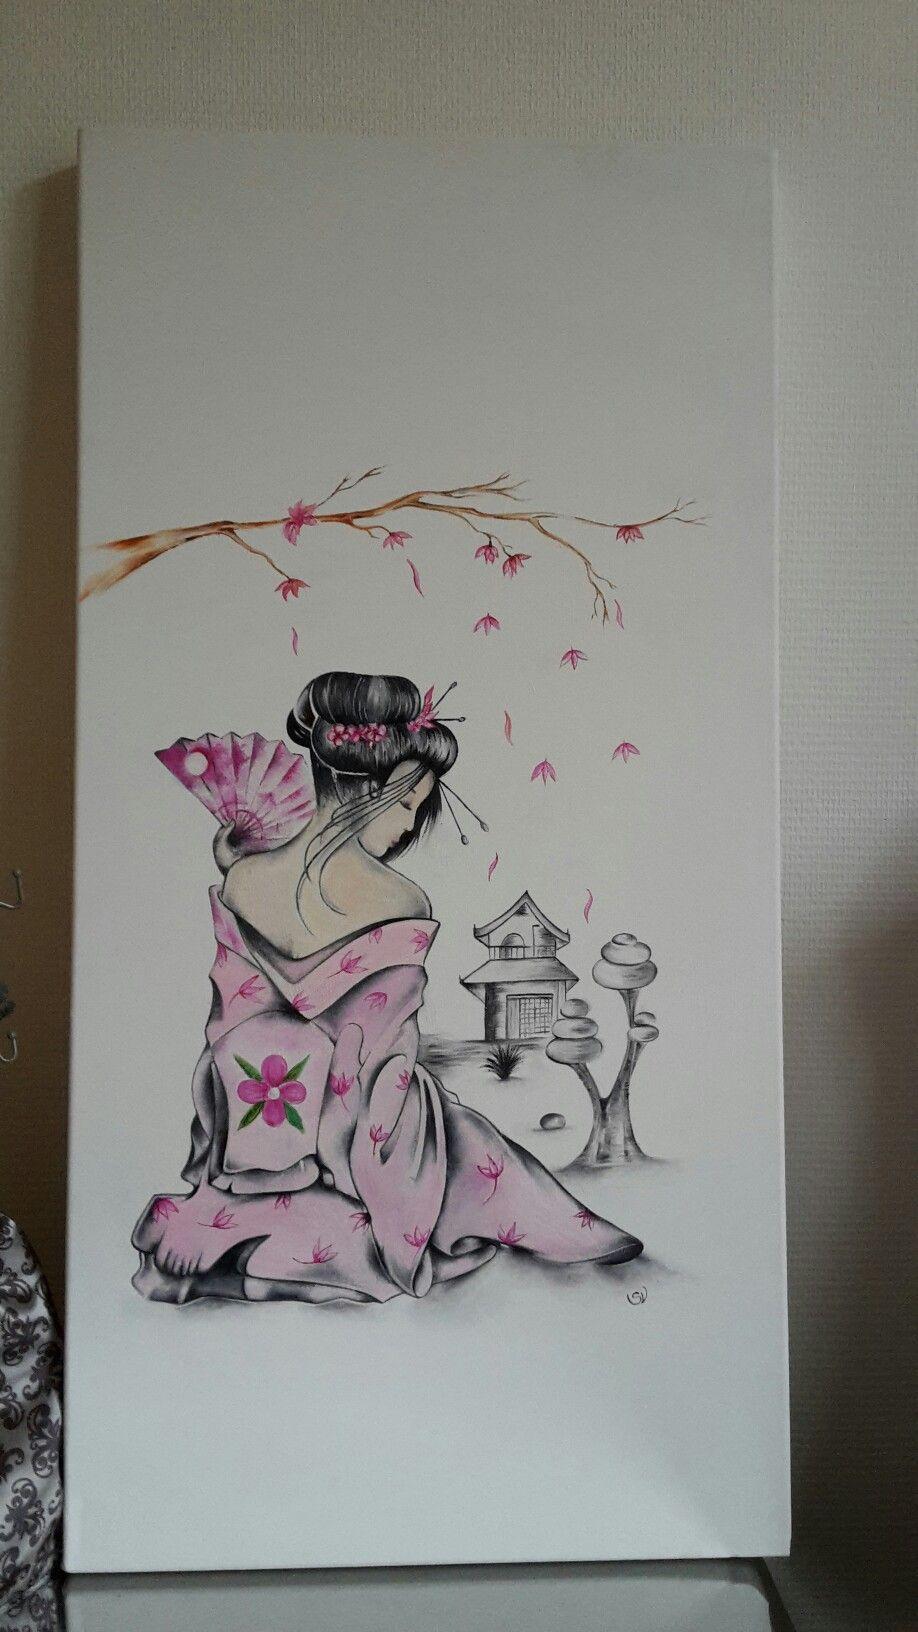 geisha huile sur toile japon pinterest peinture dessin dessin y peinture. Black Bedroom Furniture Sets. Home Design Ideas